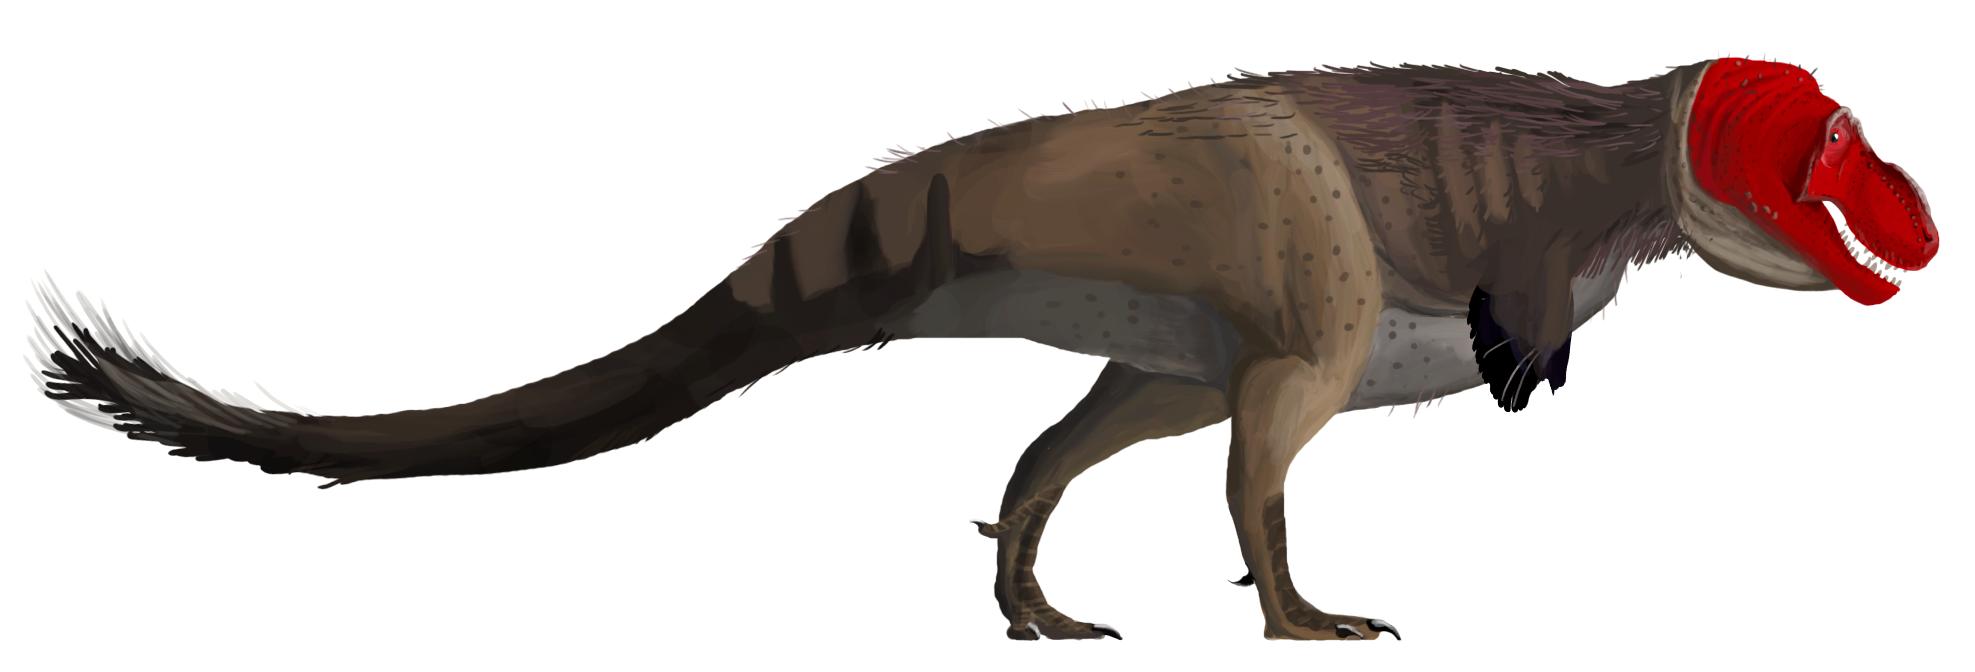 Tyrannosaurus_rex_mmartyniuk.png